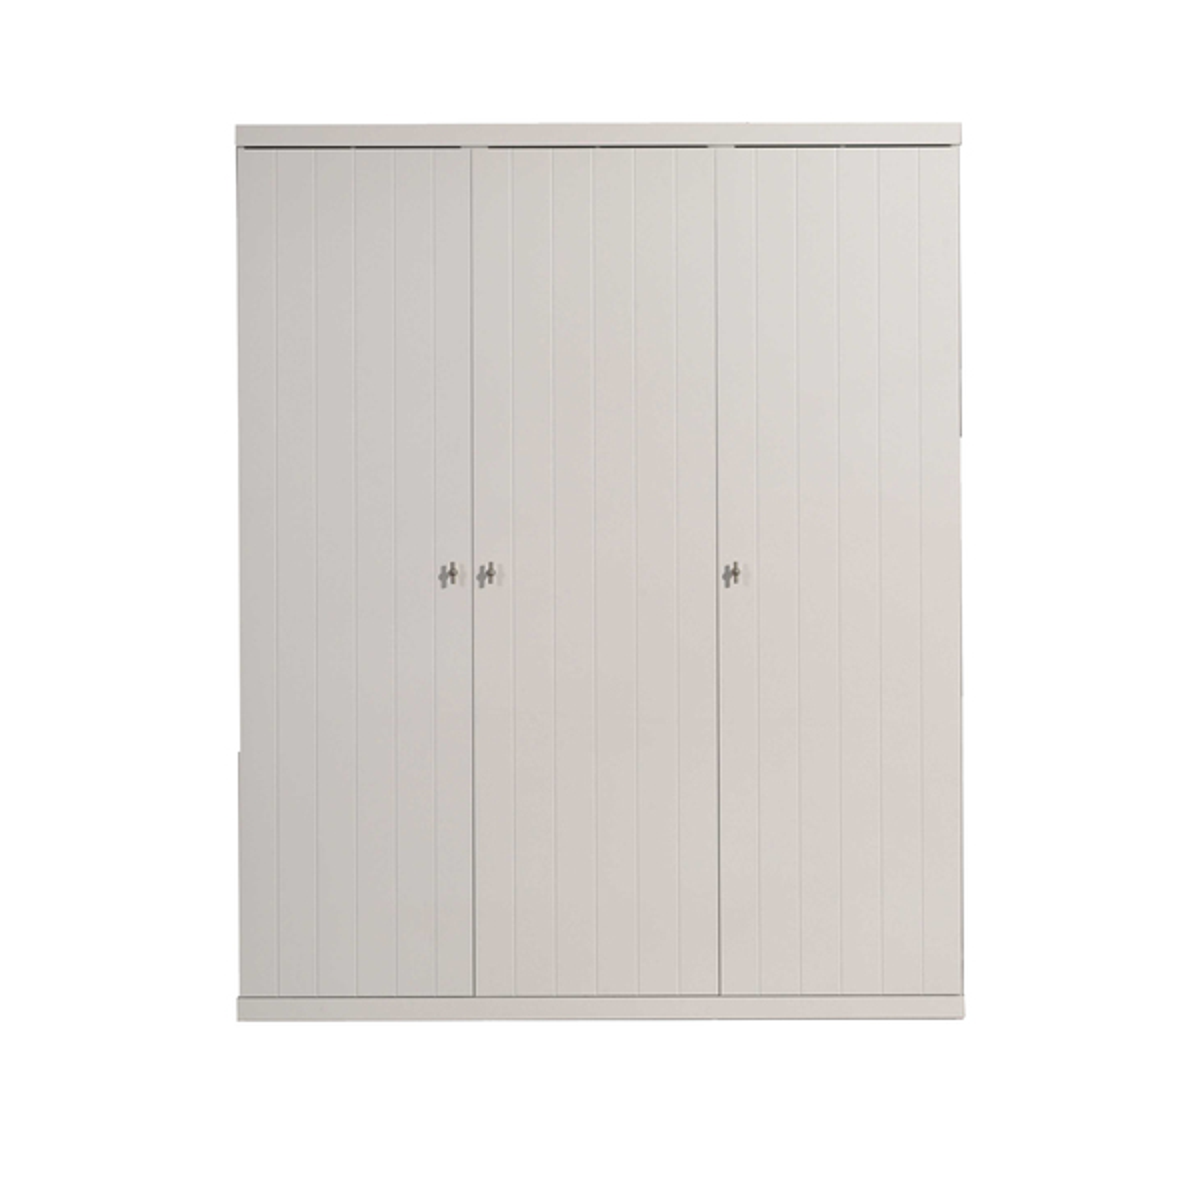 Vipack - Armoire 3 portes Robin - Blanc